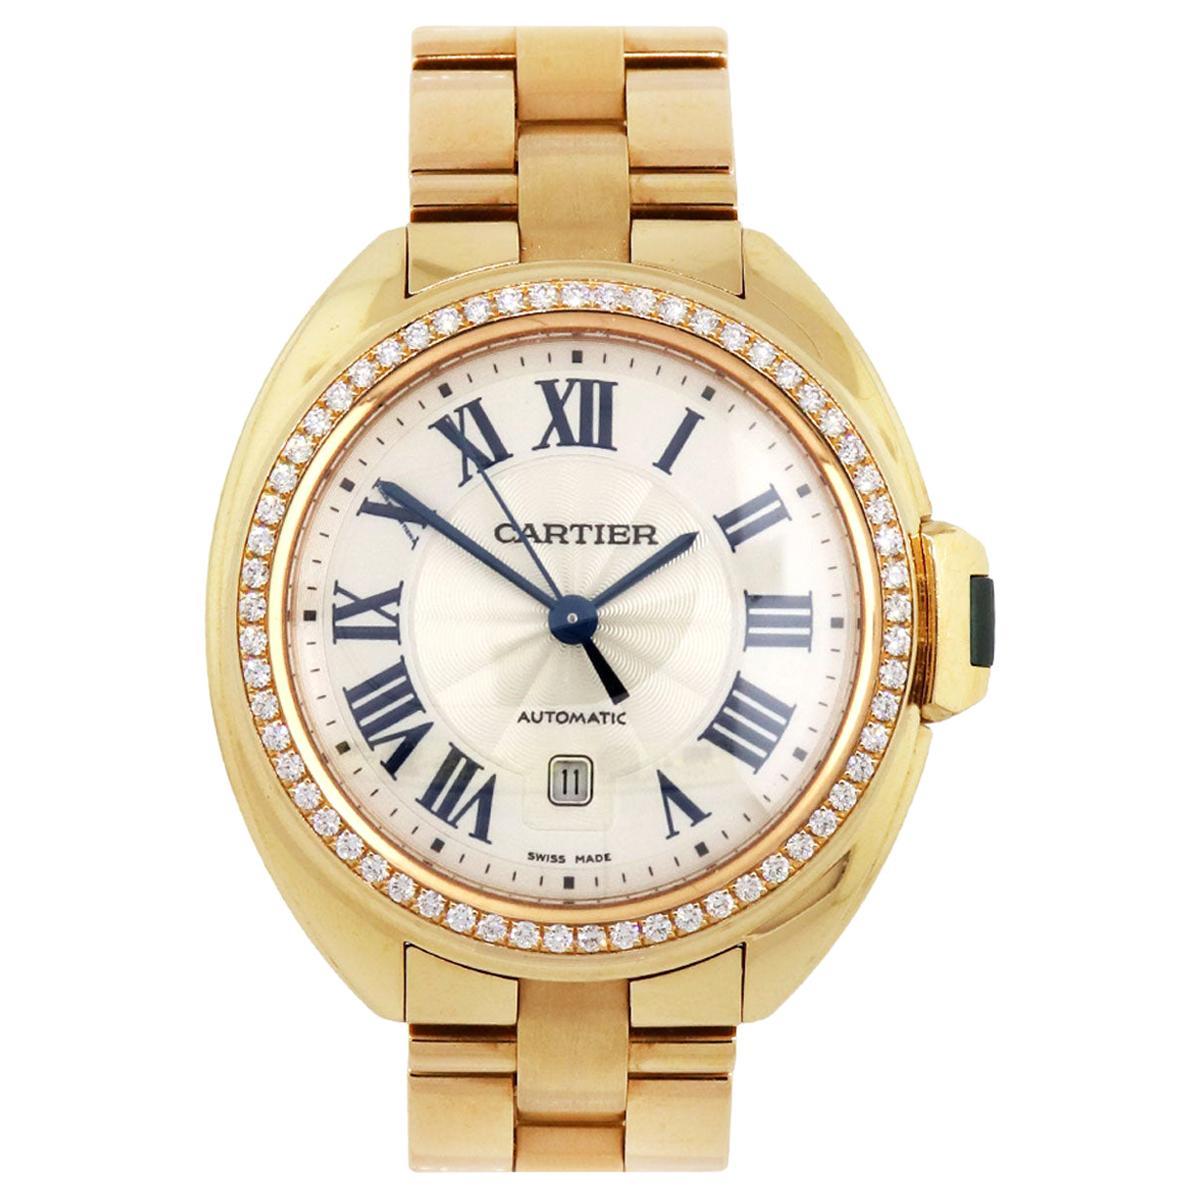 Cartier WFCL0003 Cle Wristwatch